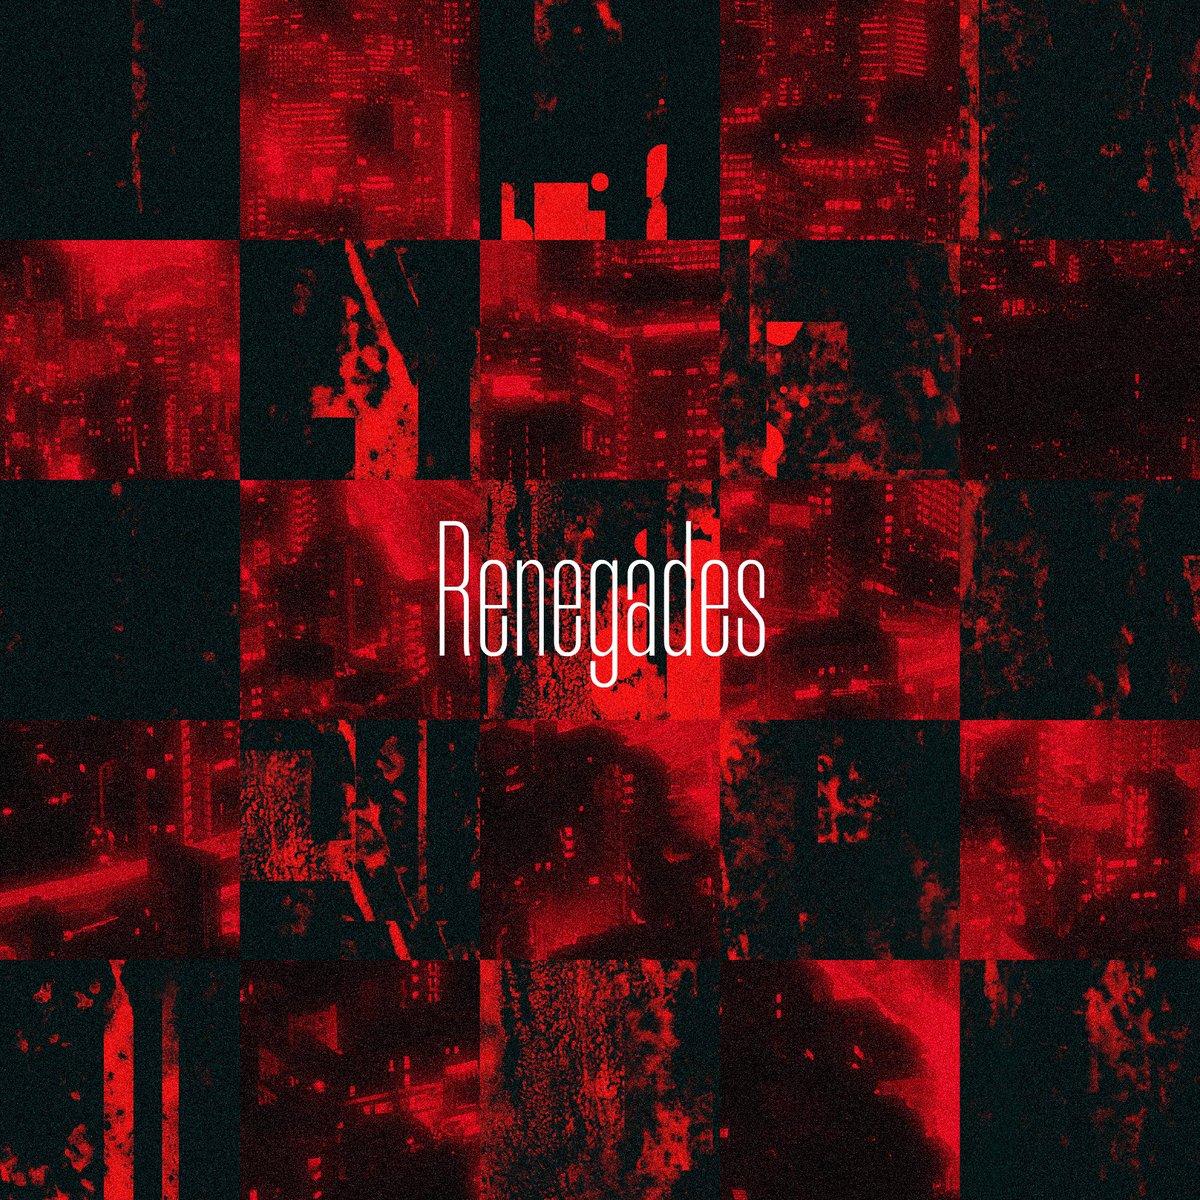 『ONE OK ROCK - Renegades』収録の『Renegades』ジャケット